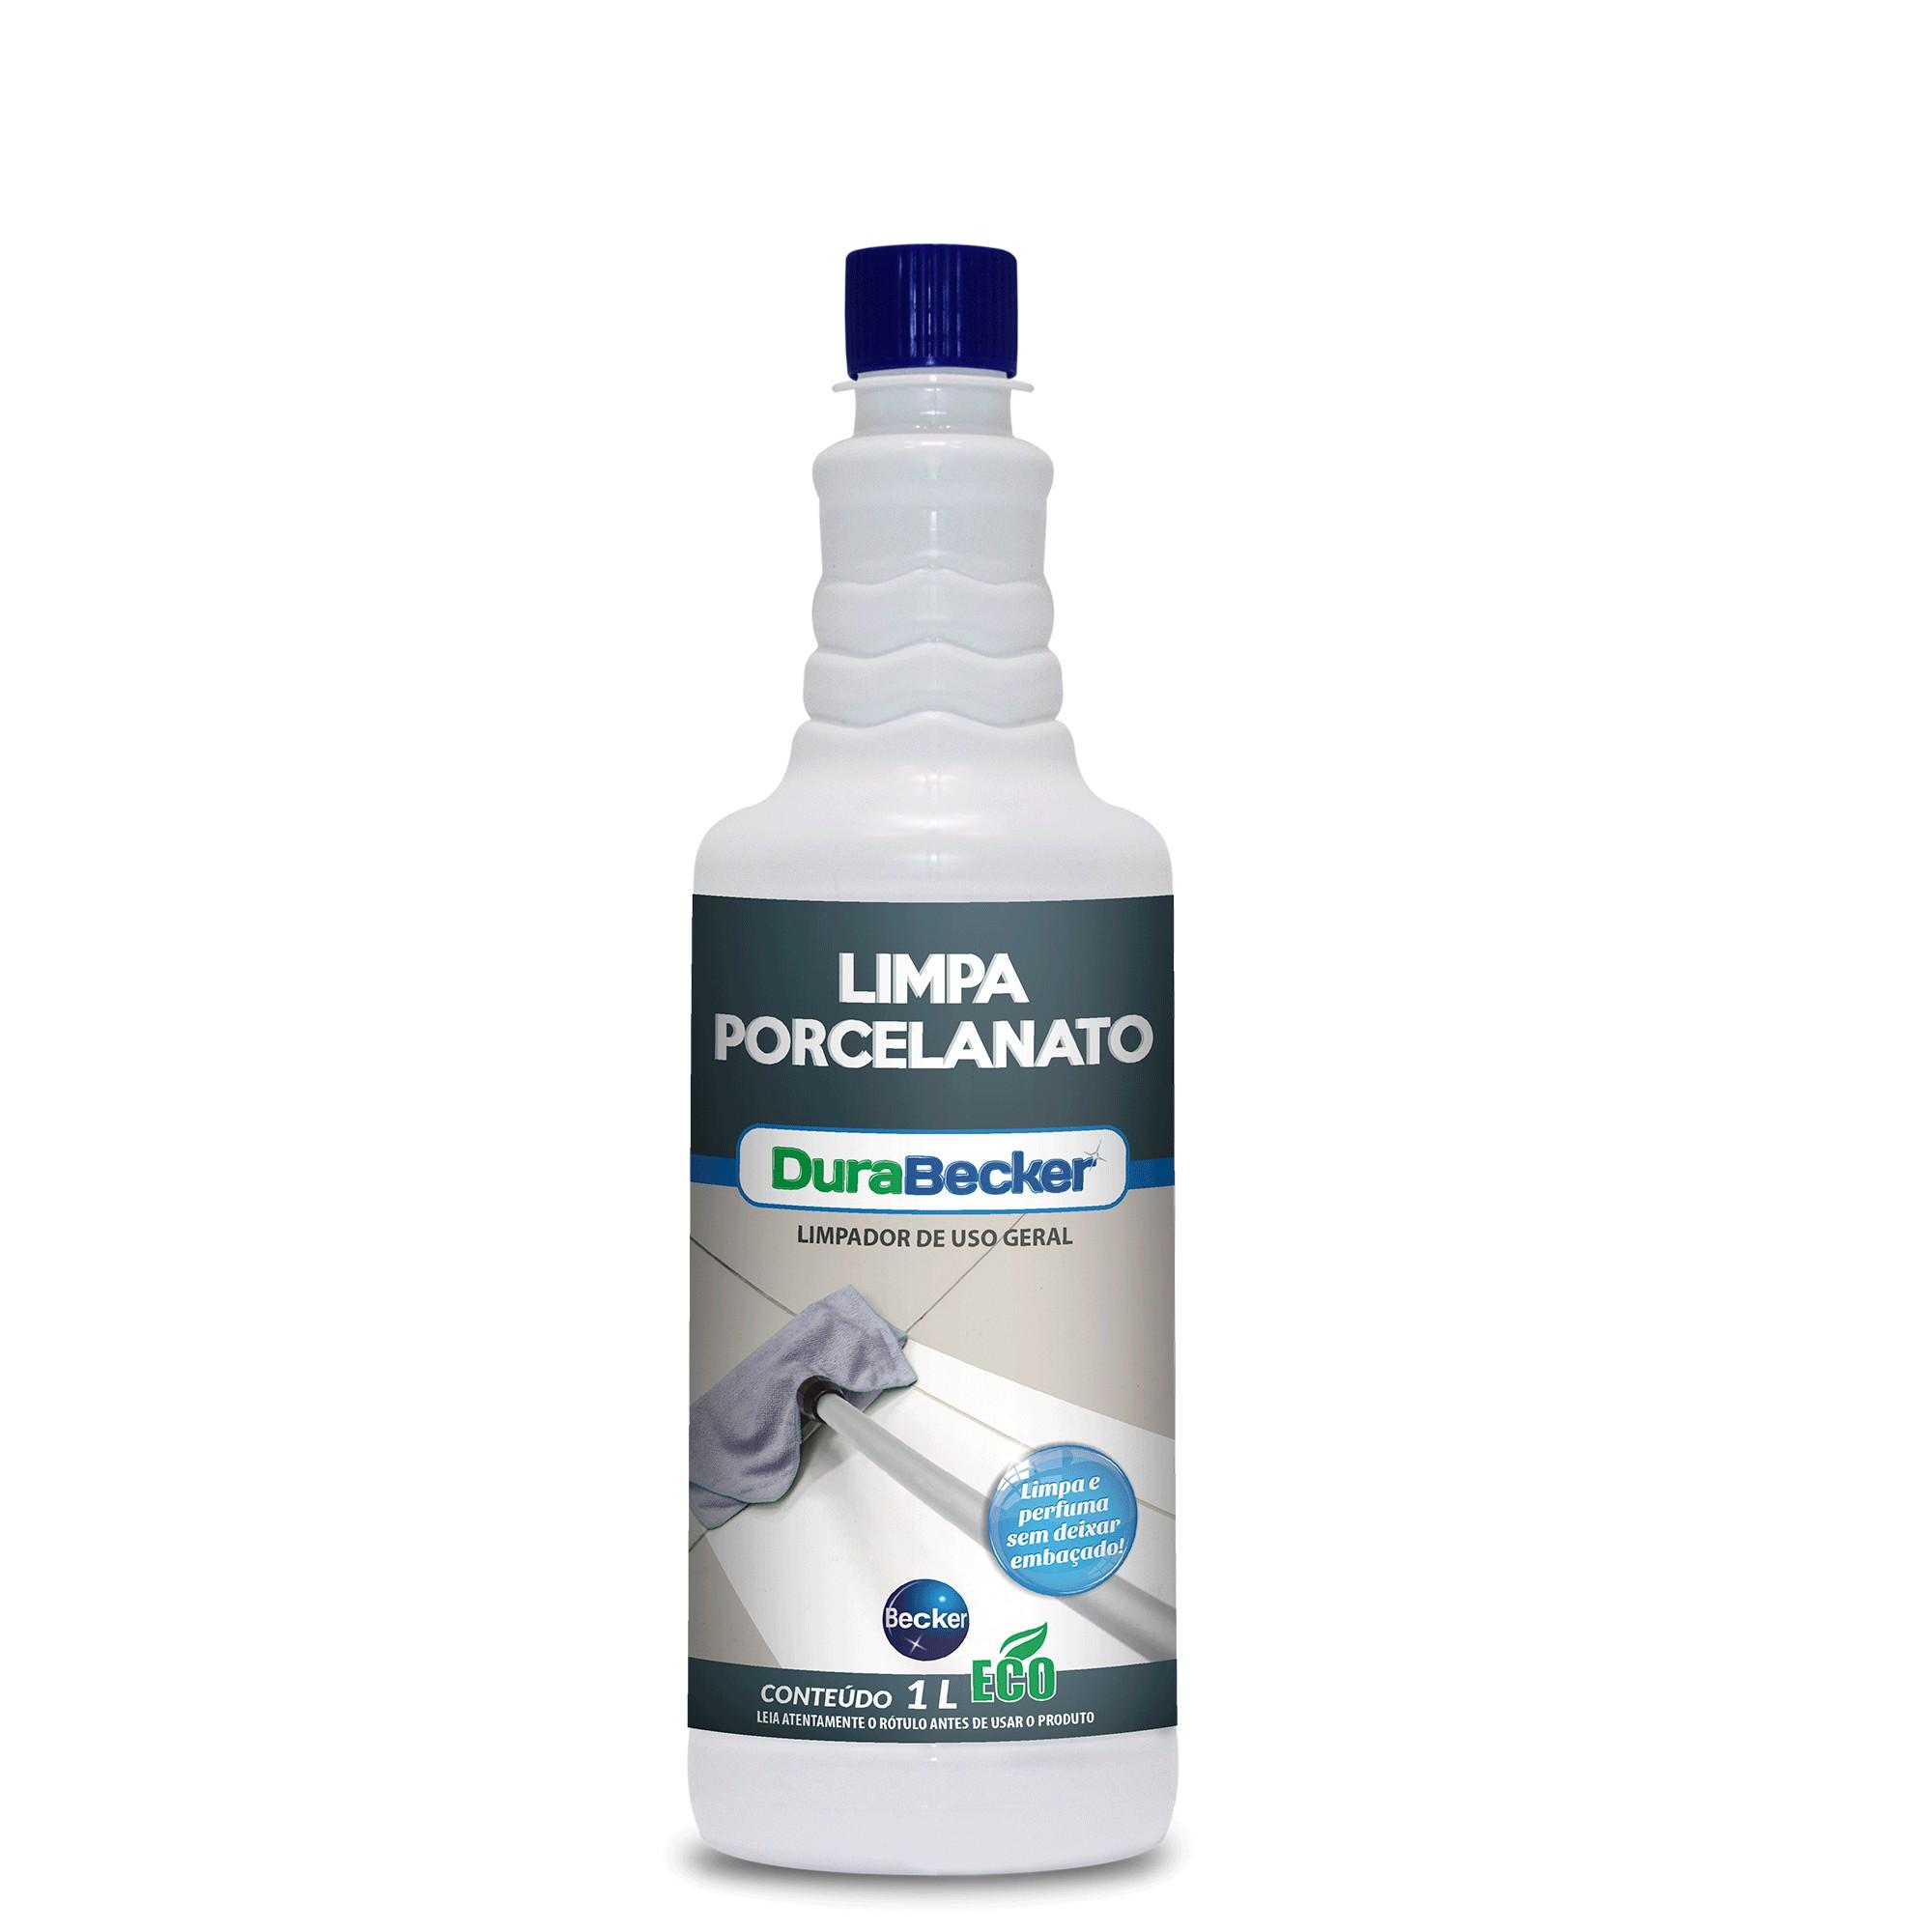 Limpa Porcelanato Durabecker 1L - Becker